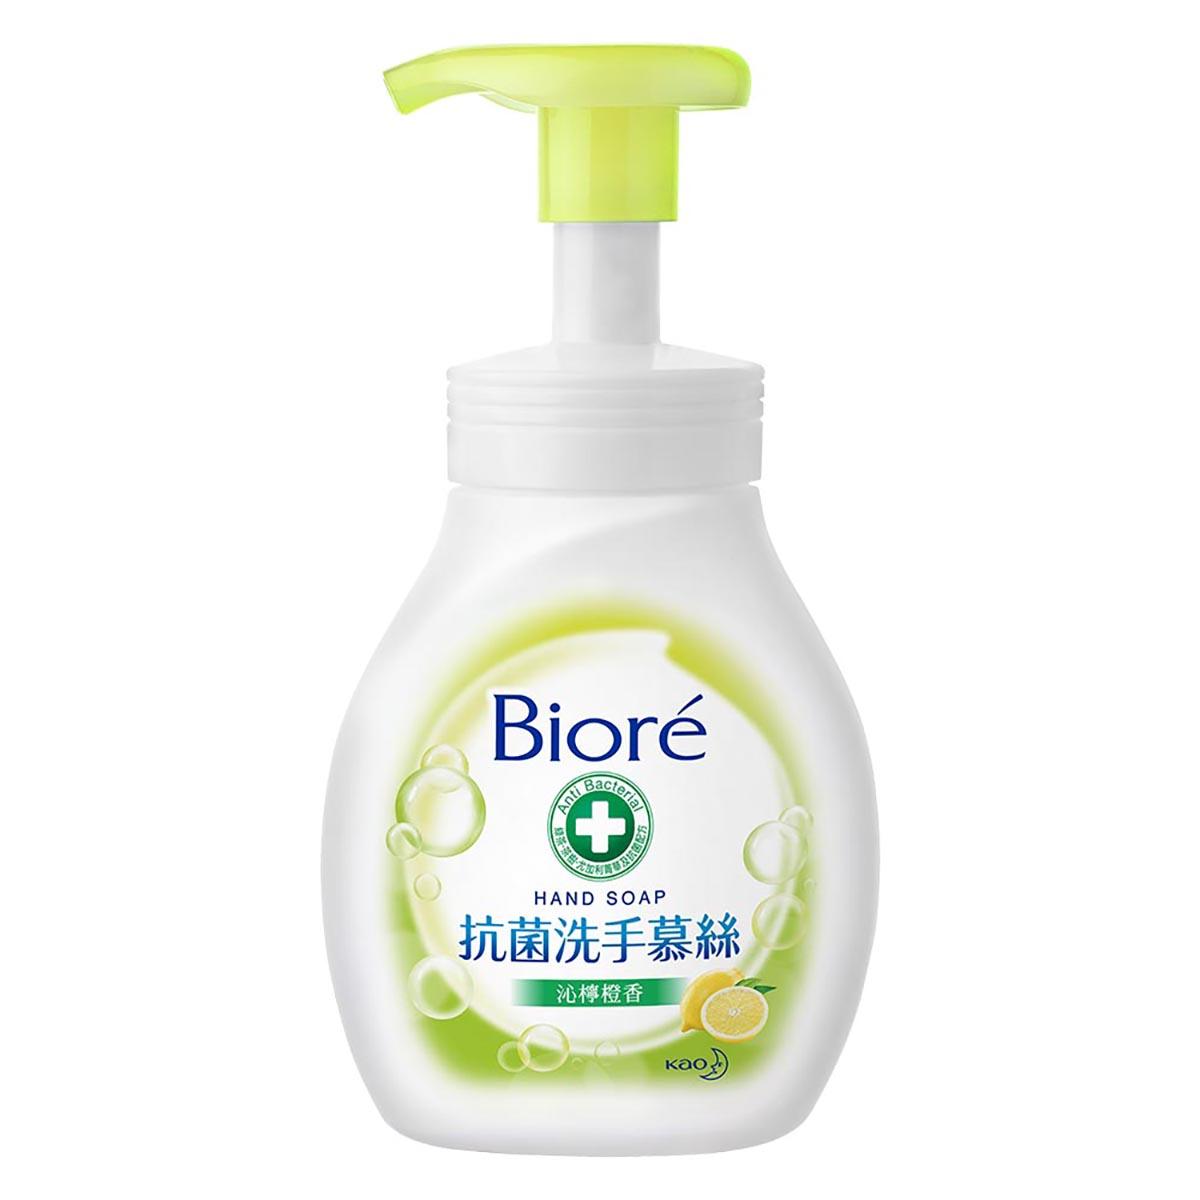 Biore蜜妮抗菌洗手慕絲沁檸橙香280ml